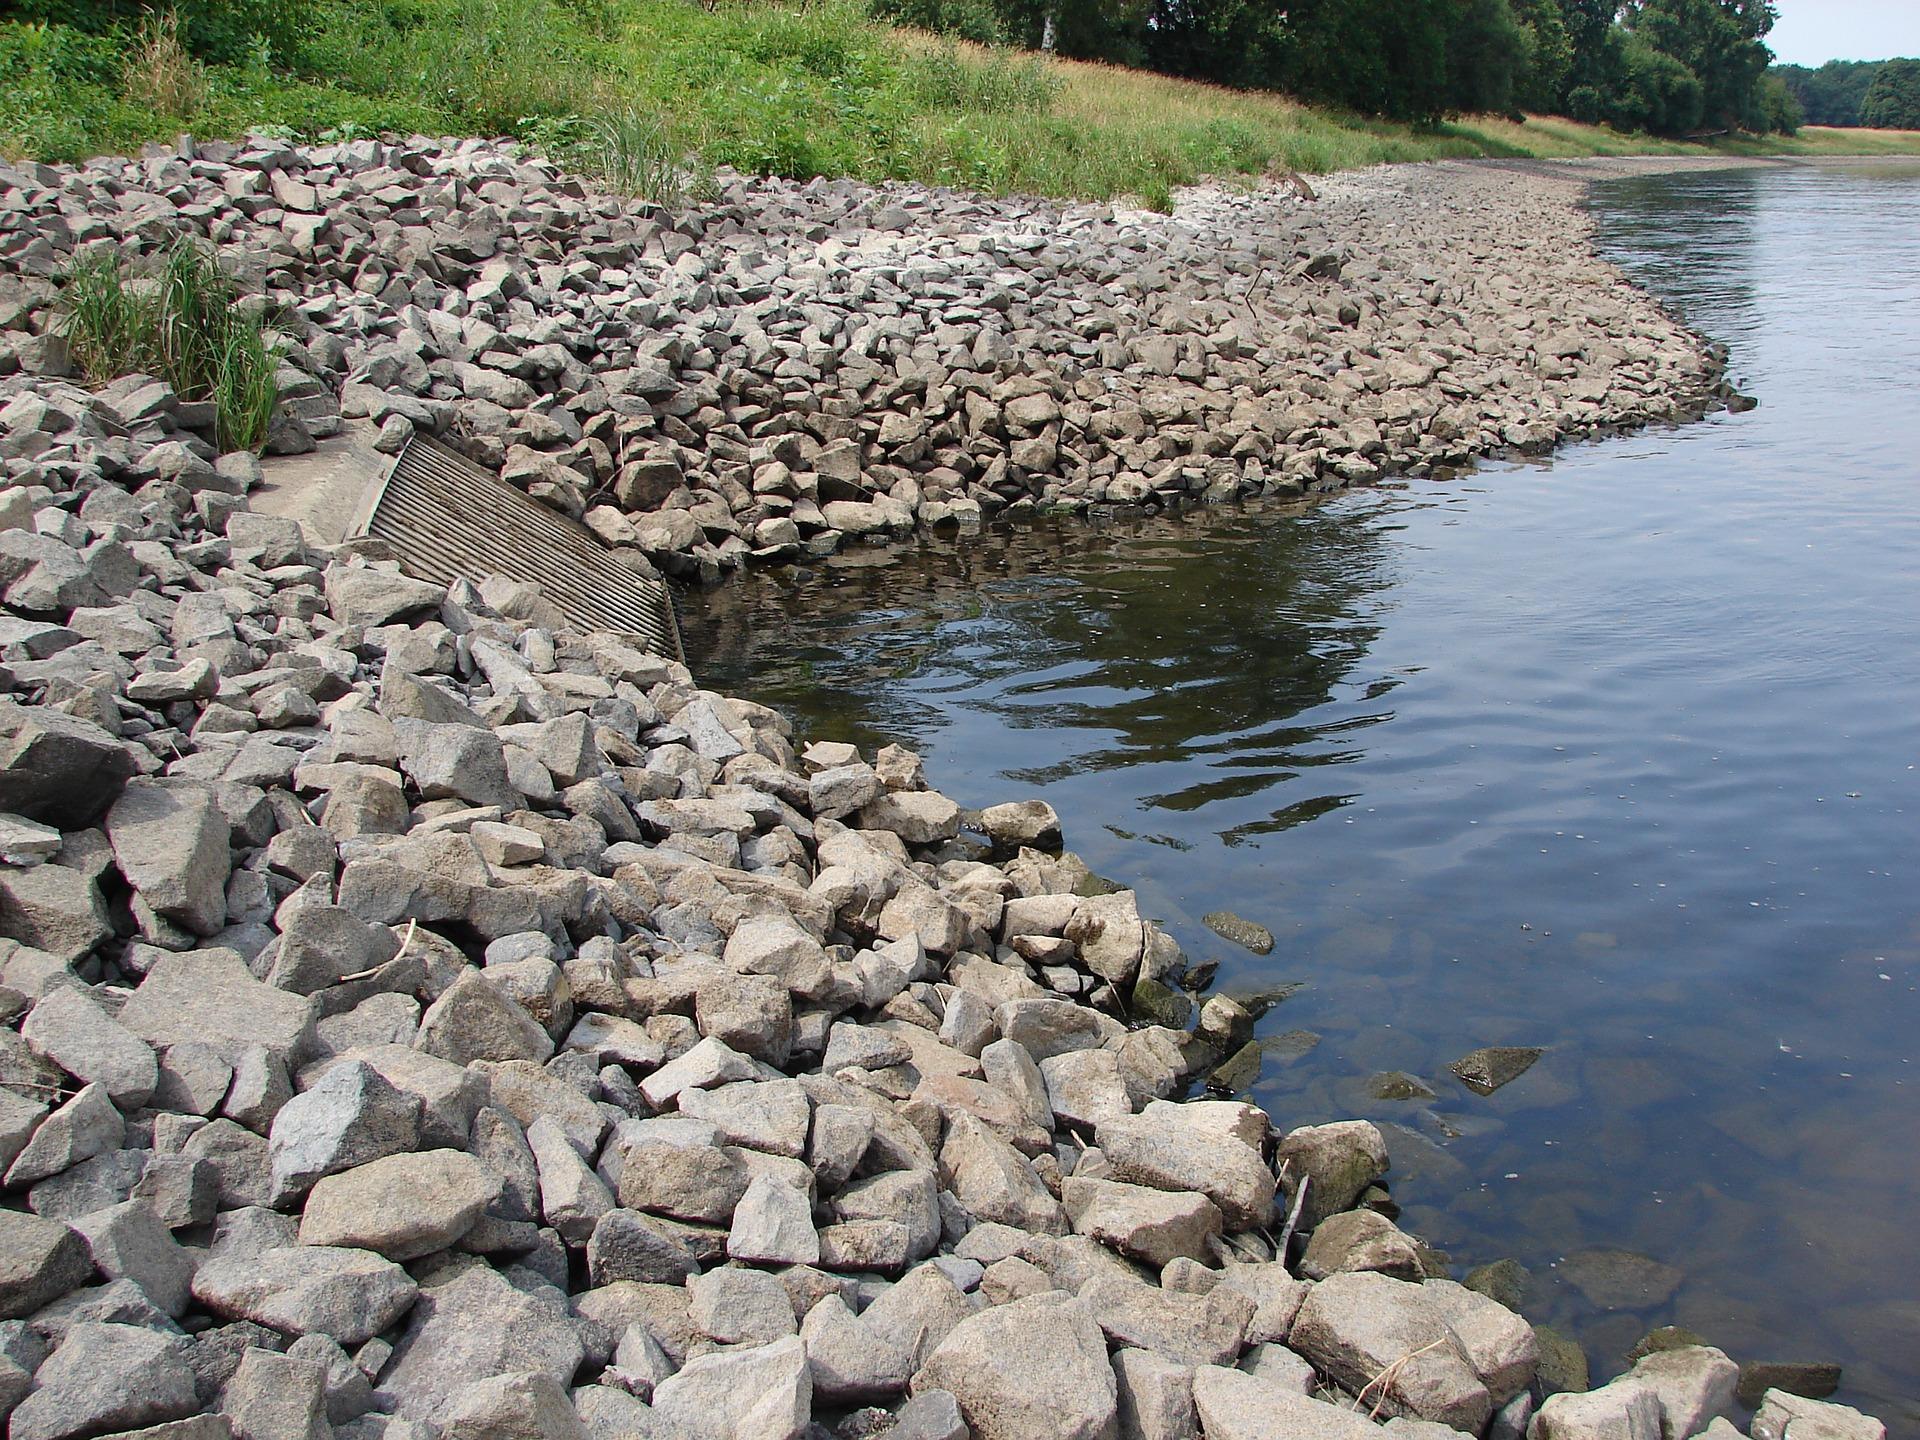 South Carolina Water Treatment Upgrades Earn Award Public Works